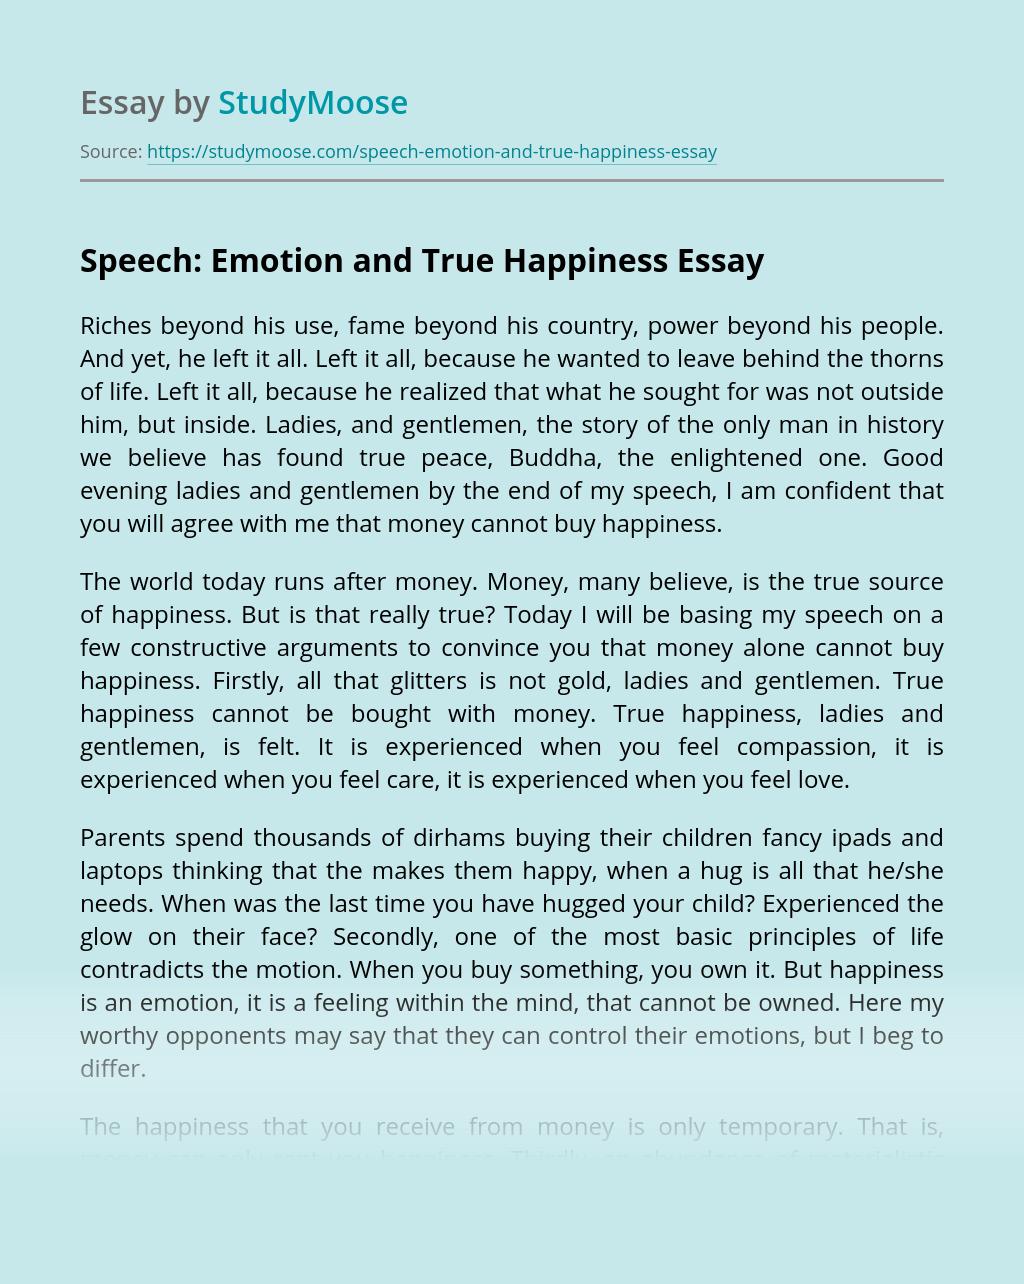 Speech: Emotion and True Happiness